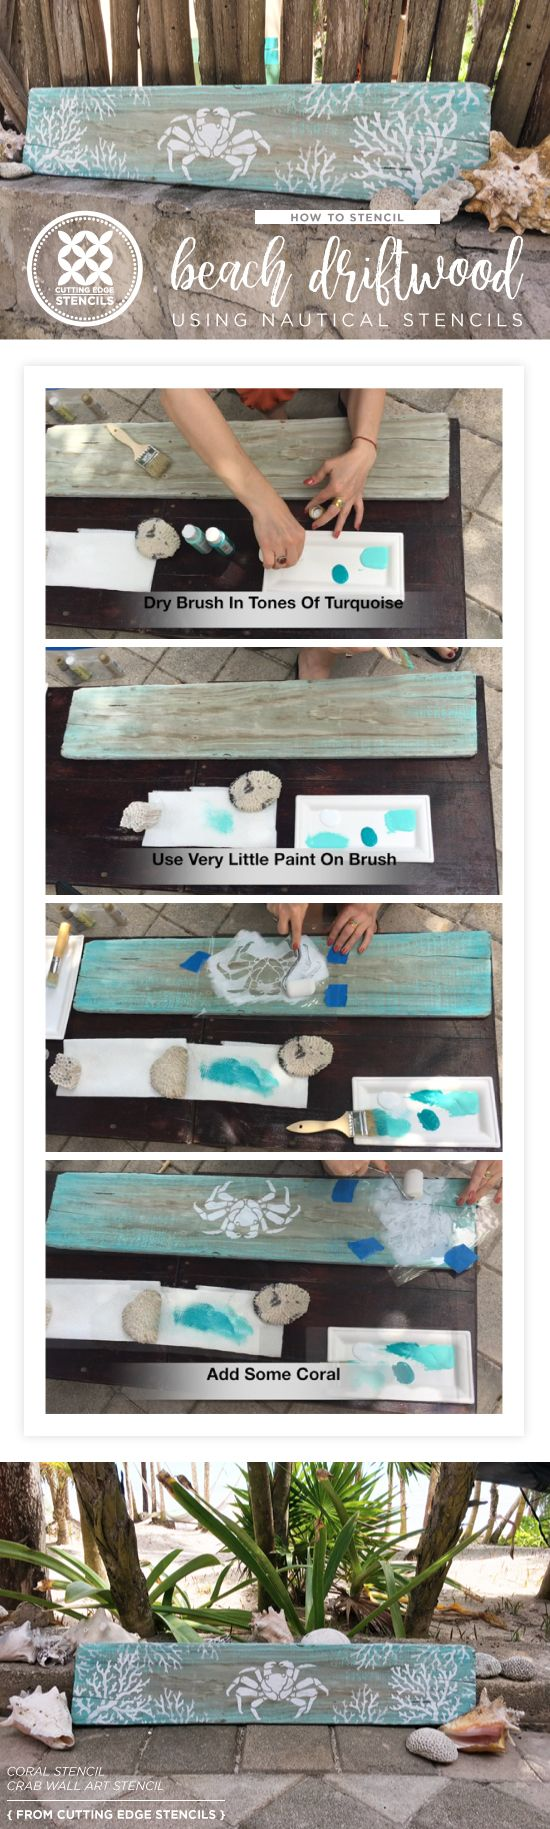 Cutting Edge Stencils shares how to craft beach wall art using driftwood and the Crab and Coral Nautical Stencils. http://www.cuttingedgestencils.com/beach-decor-stencils-designs-nautical.html